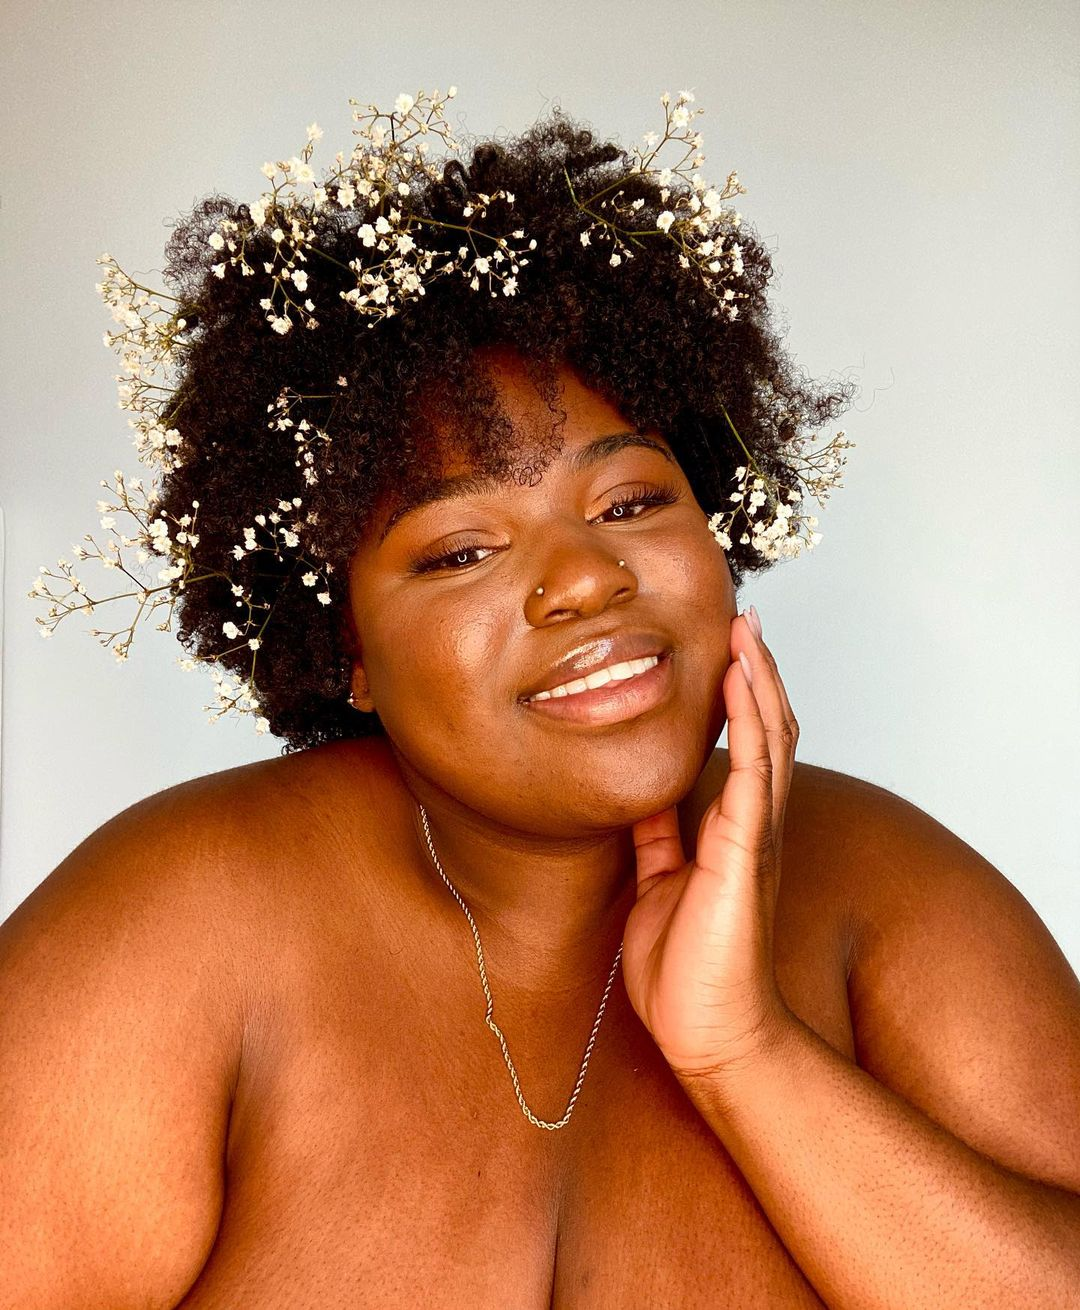 Bbw women black thick Hairy Black